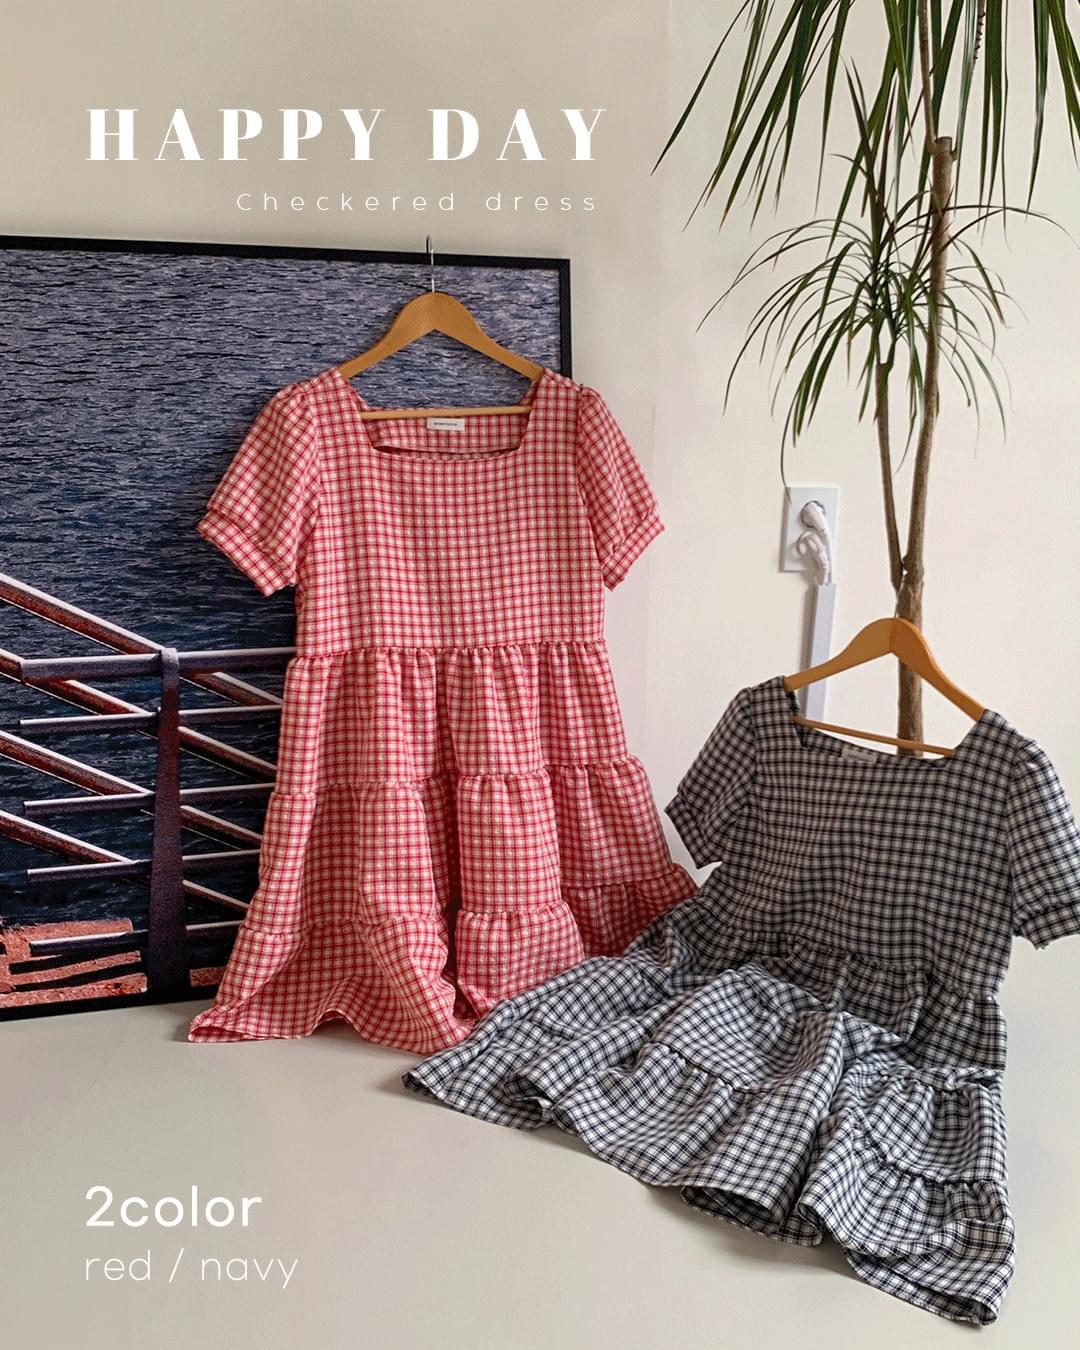 Happy Day Check Dress